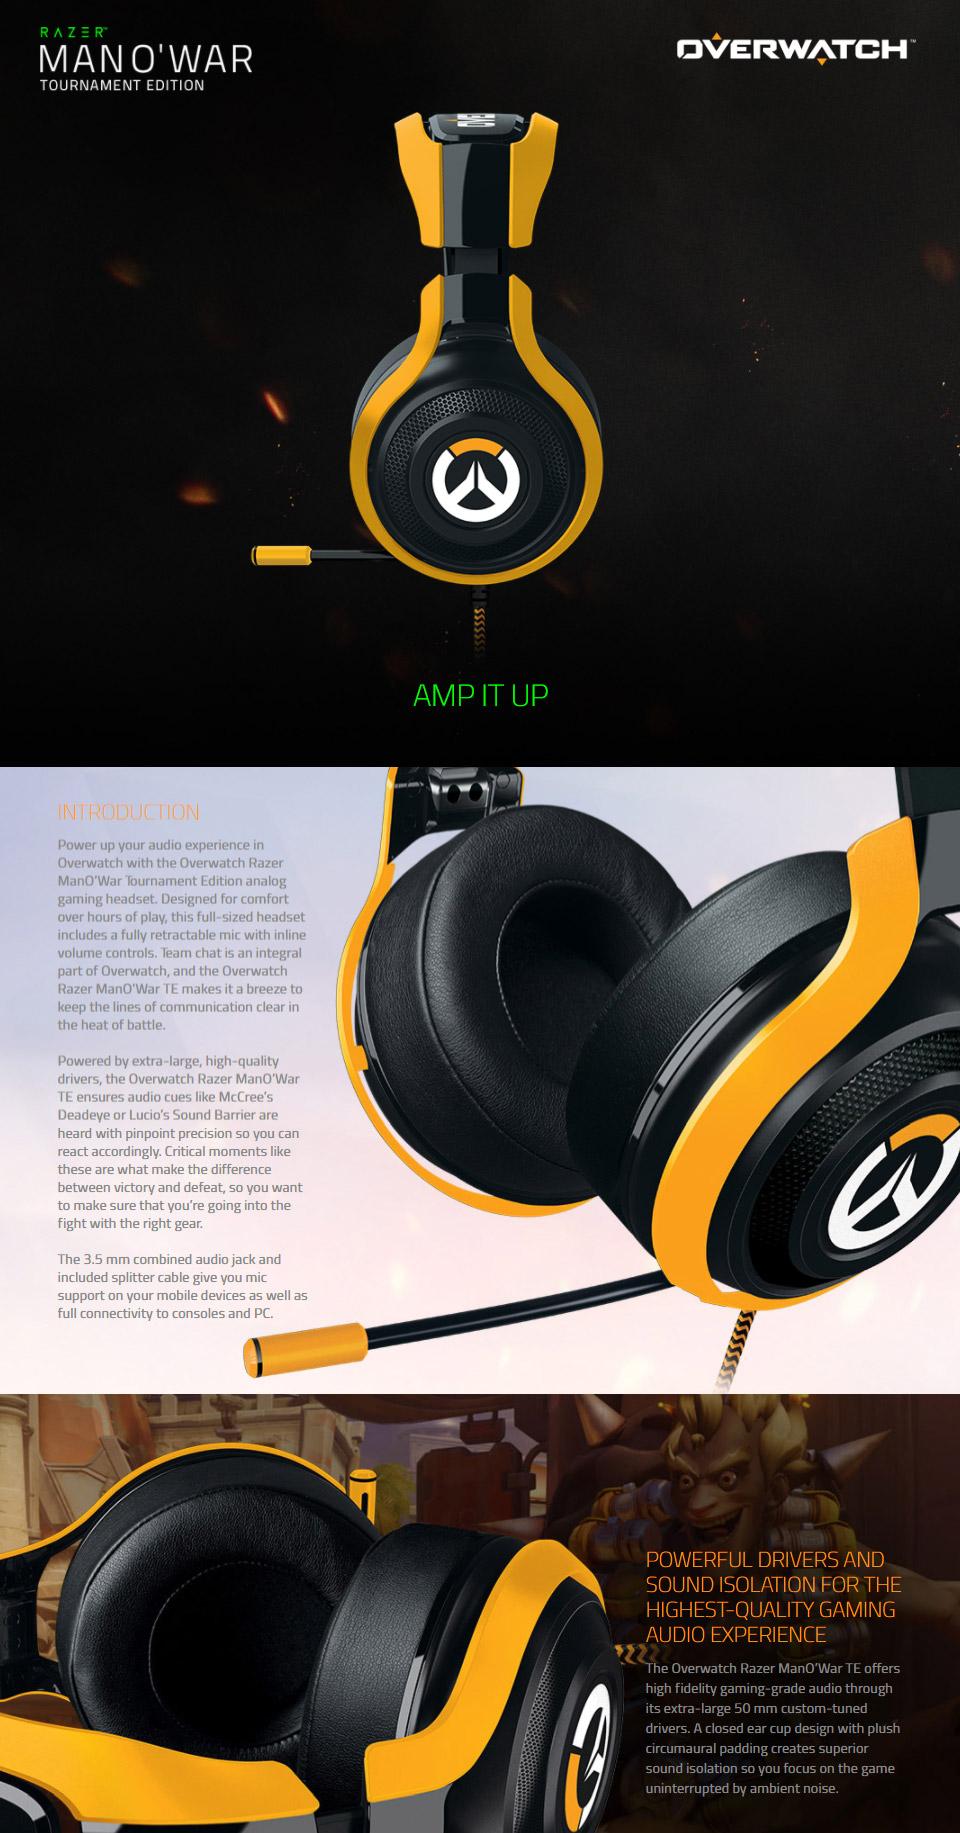 Razer Man O War Tournament Gaming Headset Overwatch Edition